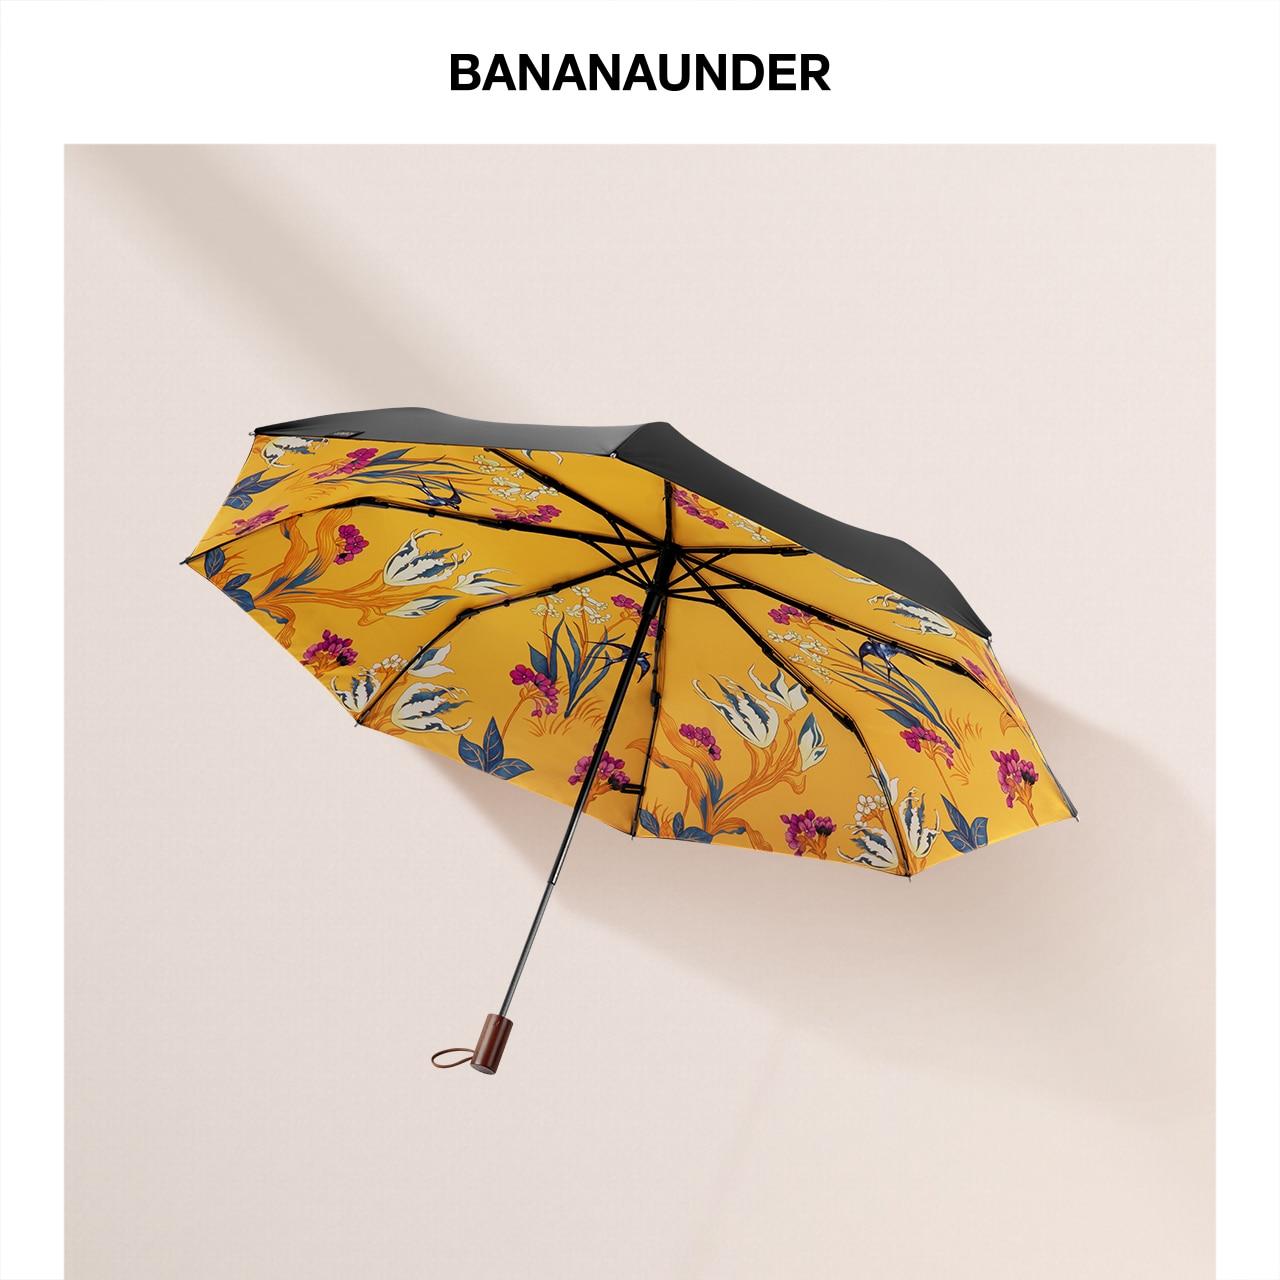 Women Windproof Umbrella Folding Business Adult Uv Protection Large Umbrella Fashion Outdoor Guarda Chuva Rain Gear BD50UU enlarge